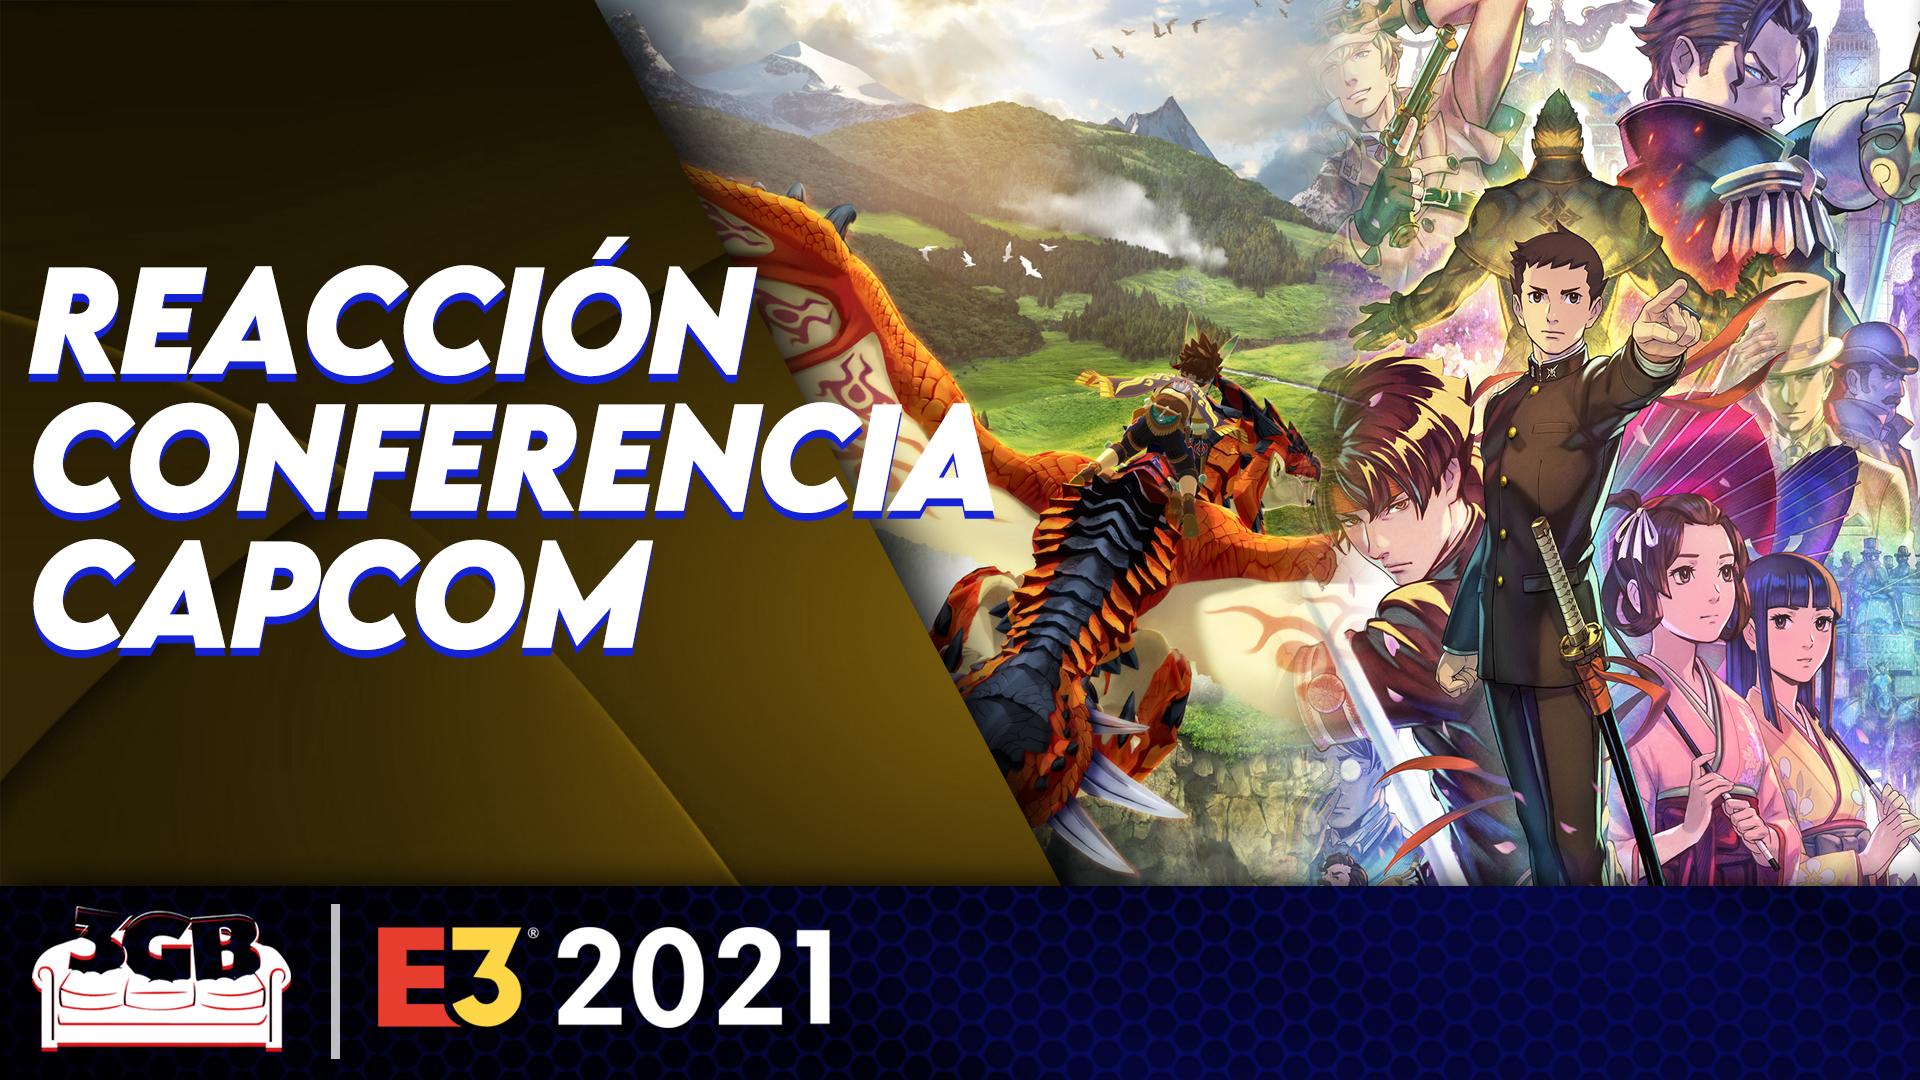 Conferencia Capcom E3 2021 – Reacción en Vivo